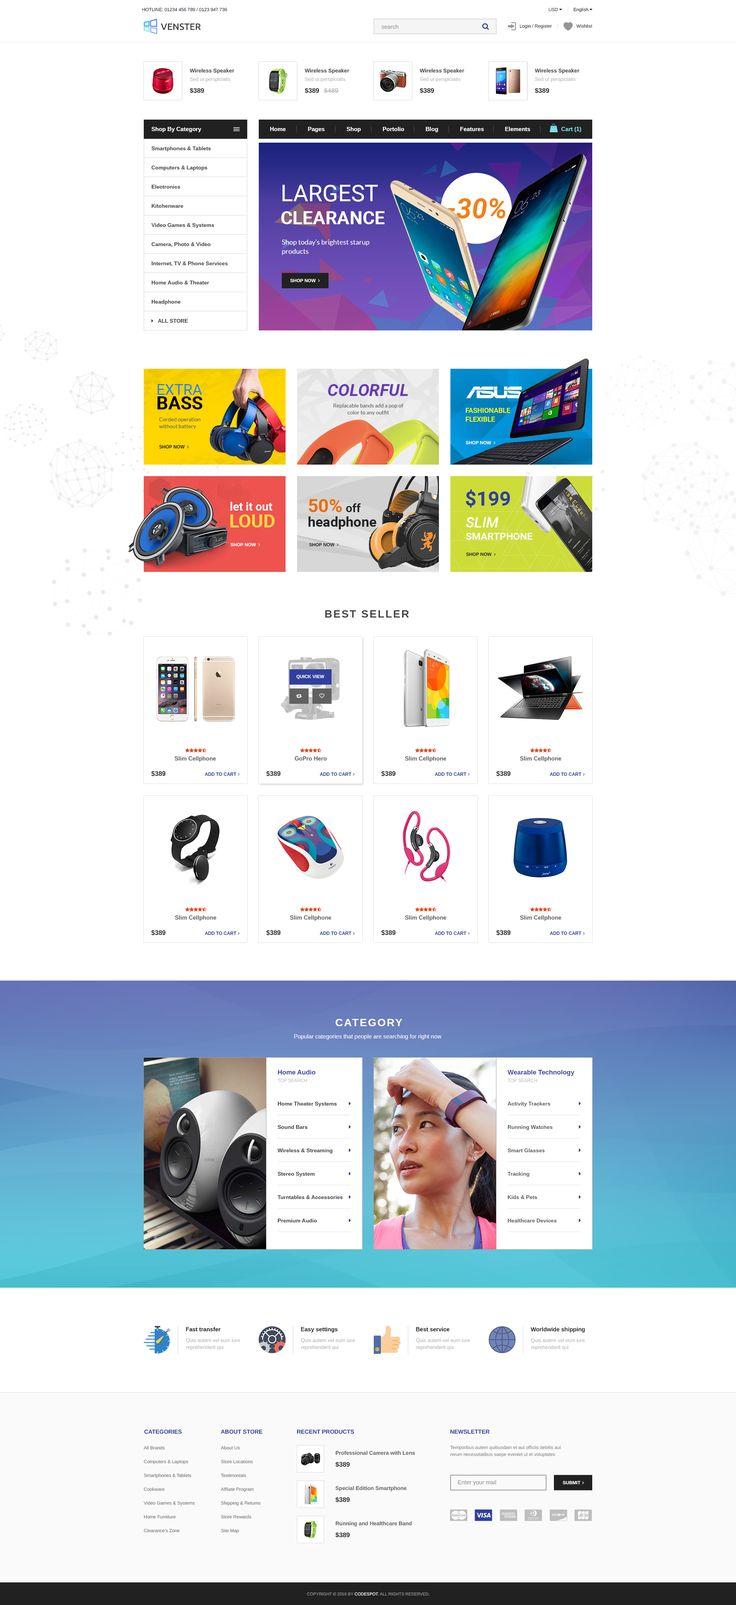 Venster - Computer Woocommerce WordPress Theme #revolution slider mobile seo #supermarket #venster fashion jewelry • Download ➝ https://themeforest.net/item/venster-computer-woocommerce-wordpress-theme/19781588?ref=pxcr